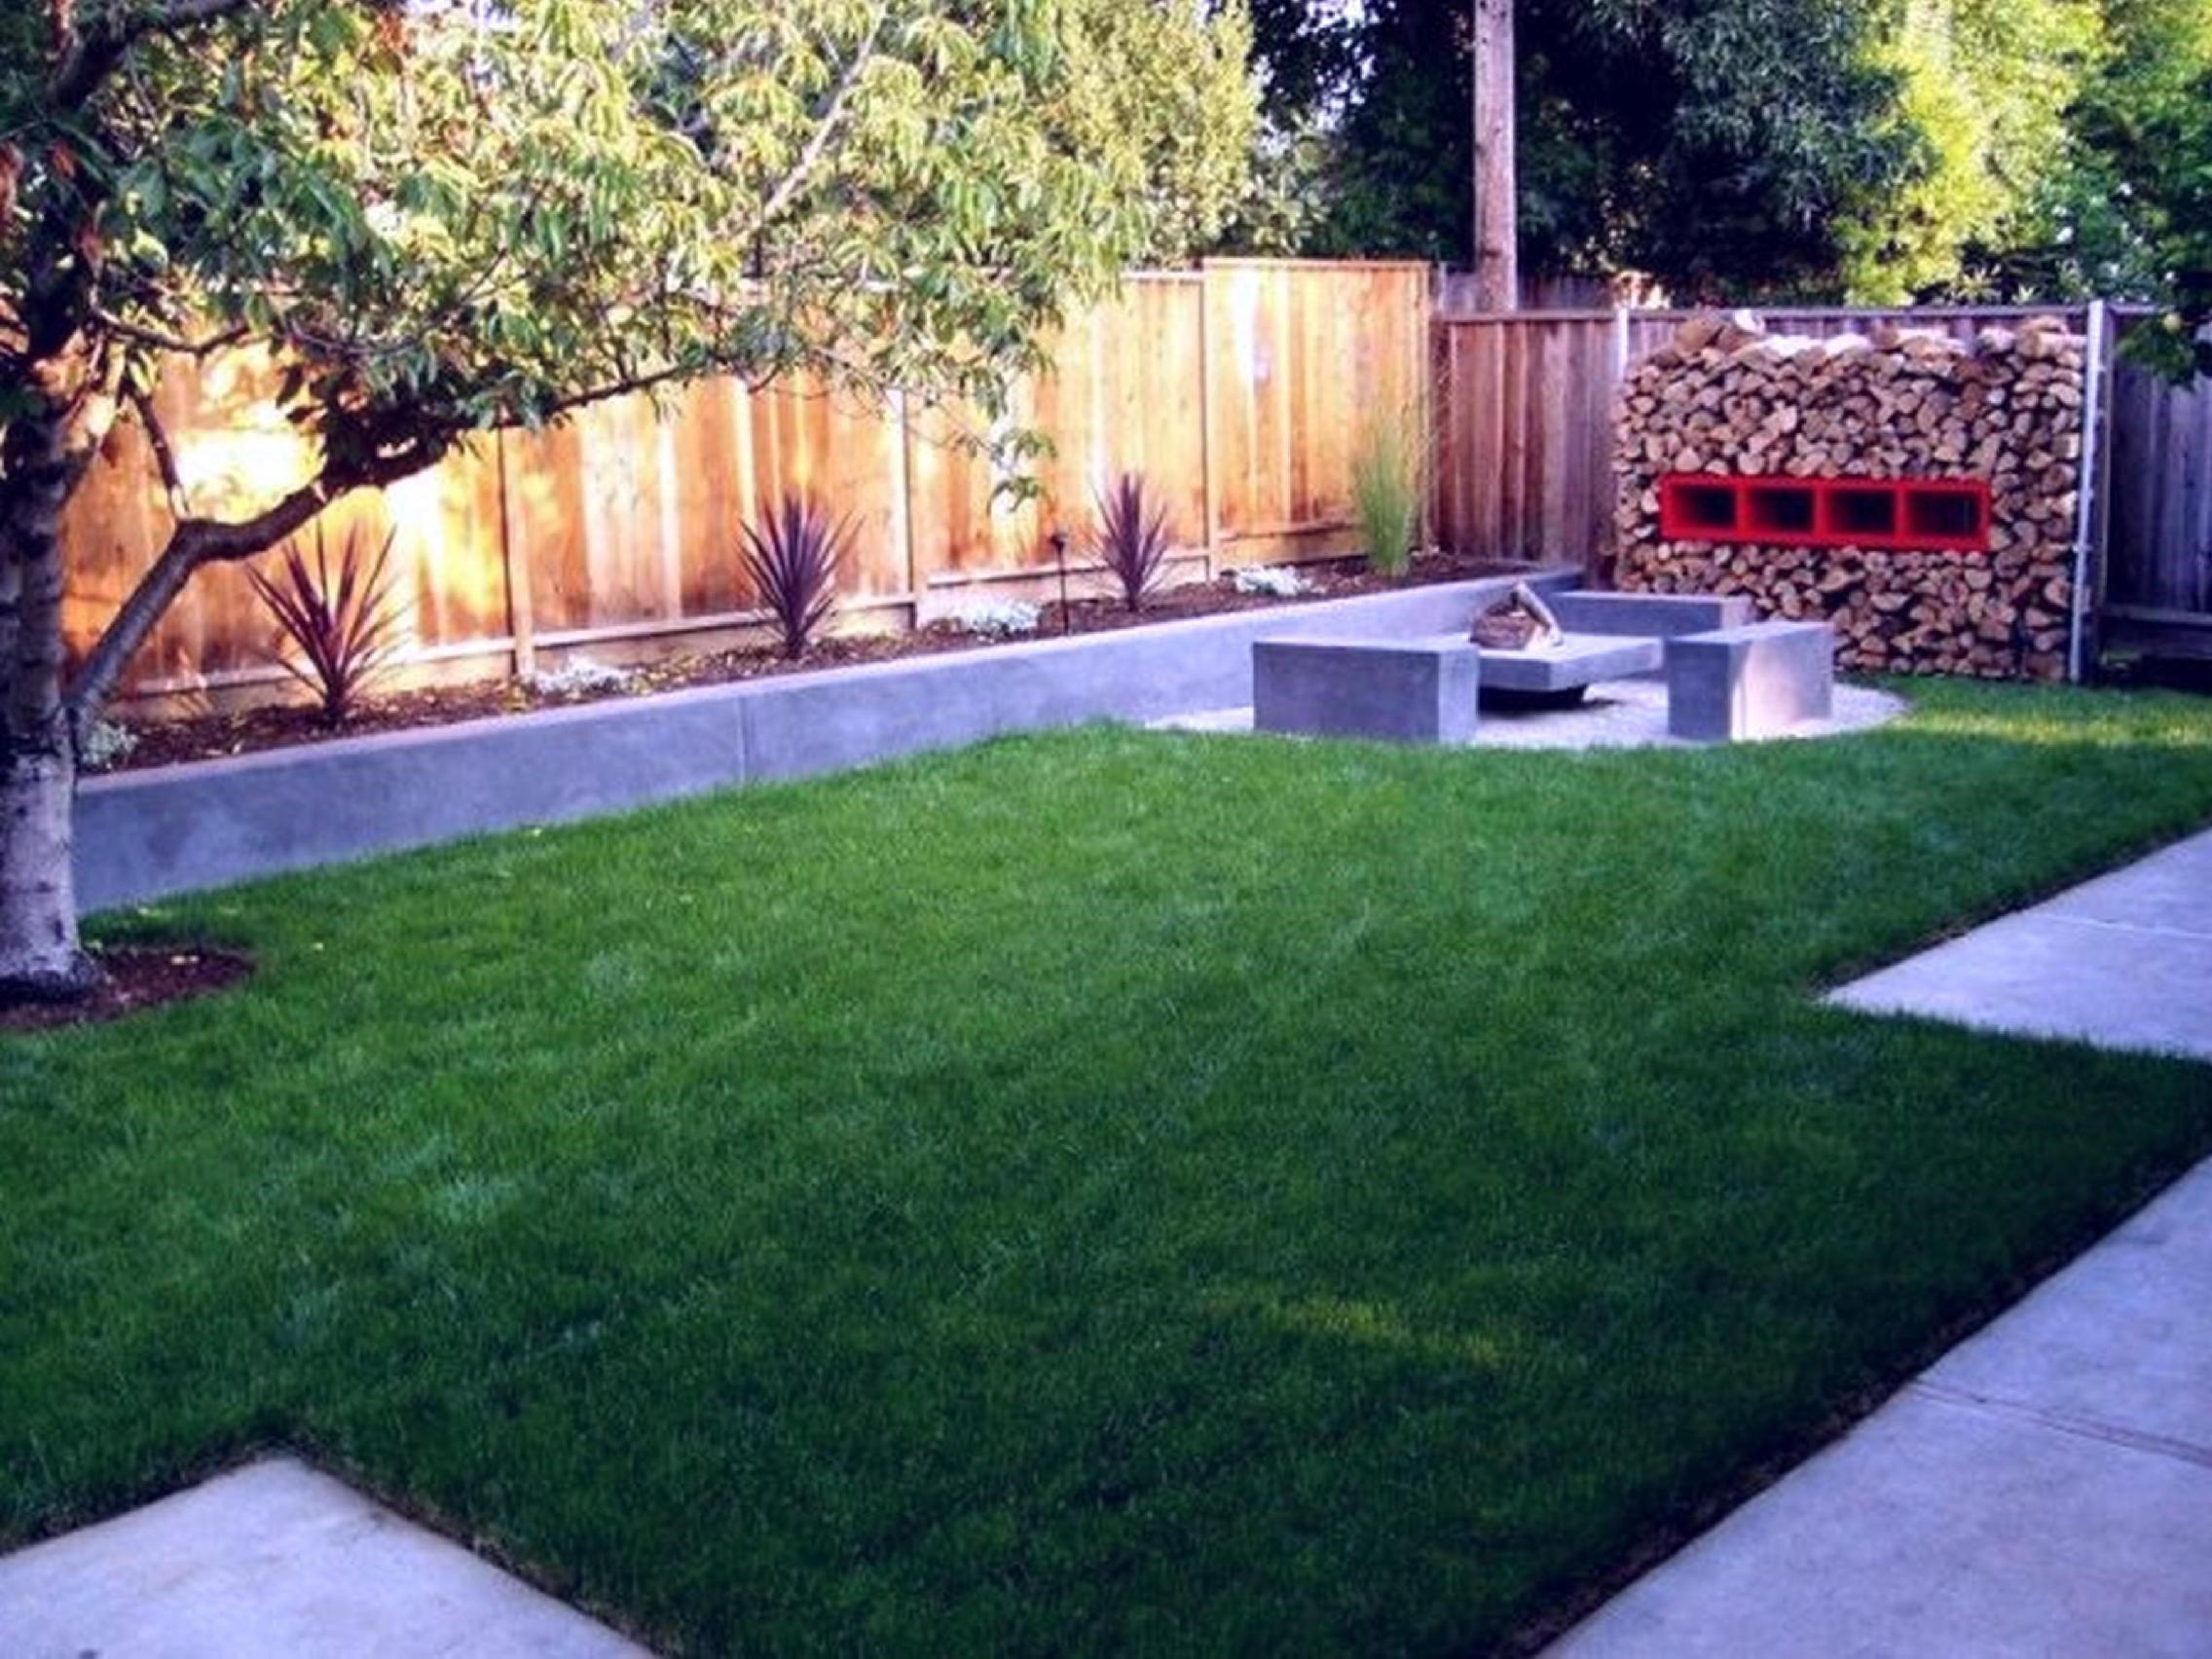 Lush green lawns